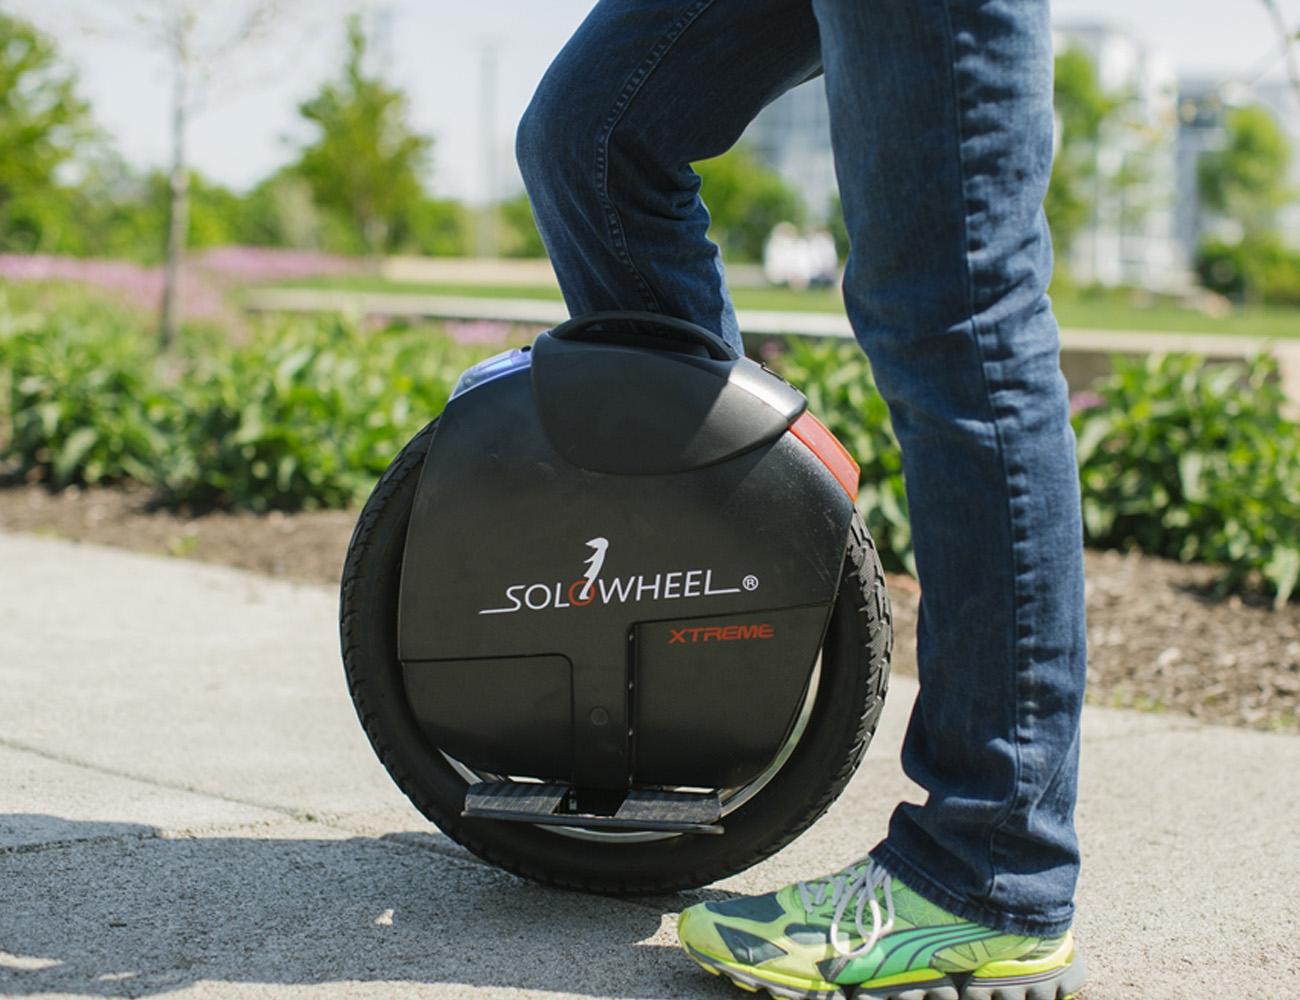 solowheel-xtreme-electric-unicycle-01